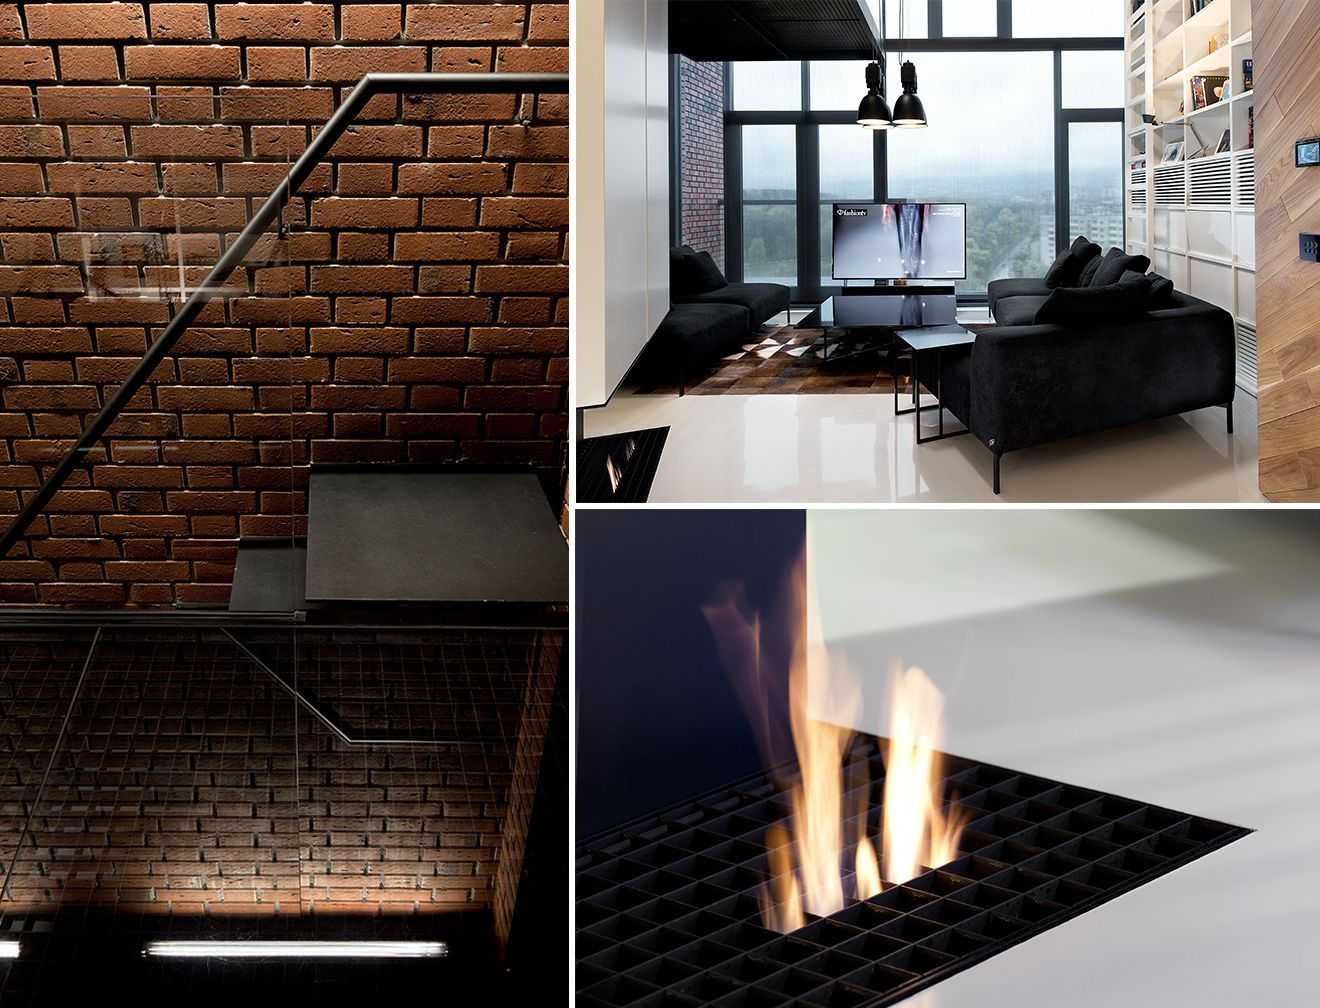 Modern Luxury Industrial Interior Design From Studio Mode